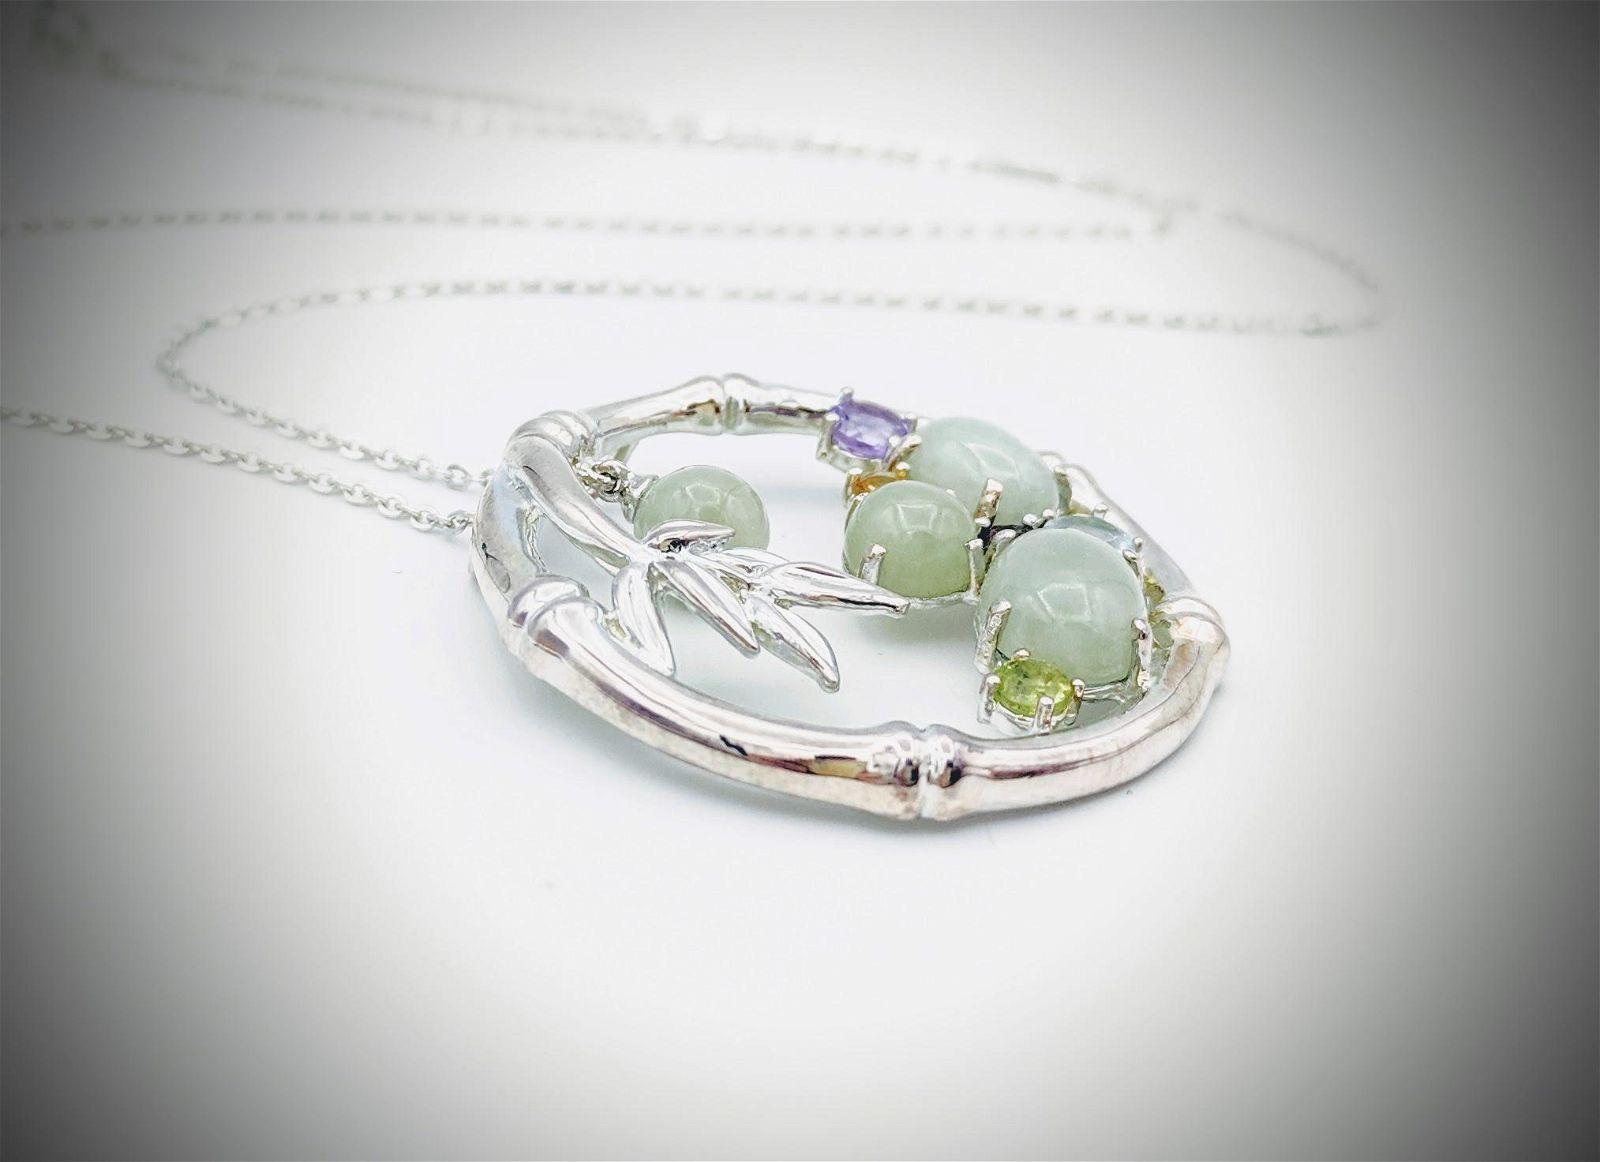 Necklace & Pendant w Jade, Blue Topaz, Amethyst,